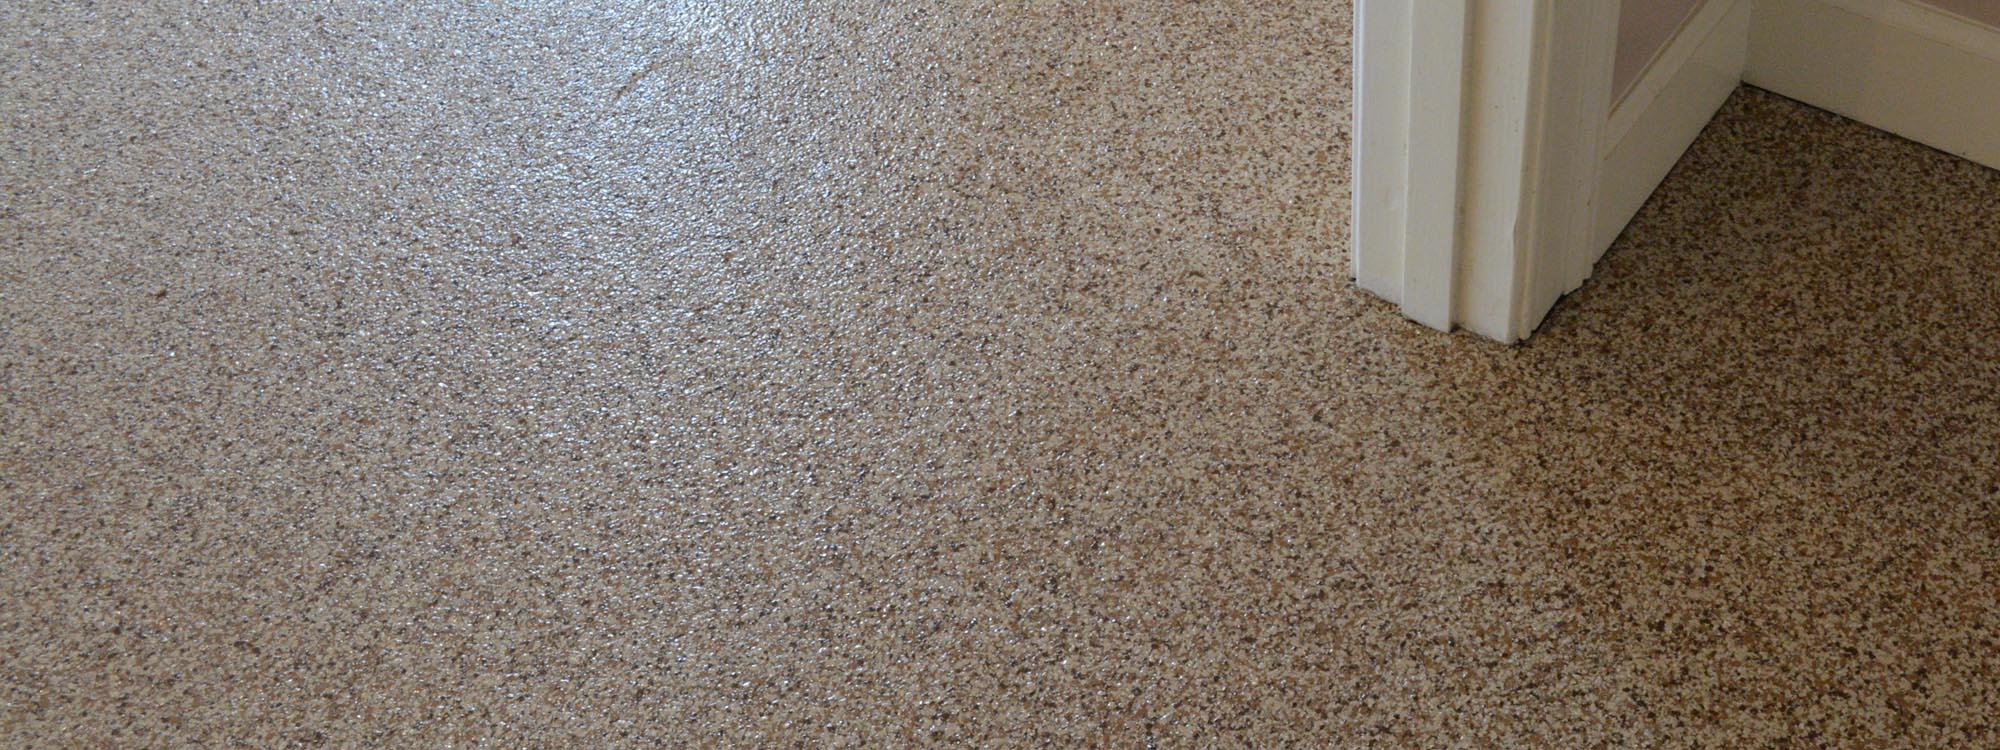 Surfacescapes concrete coatings restoration and concrete for Best product to clean concrete garage floor